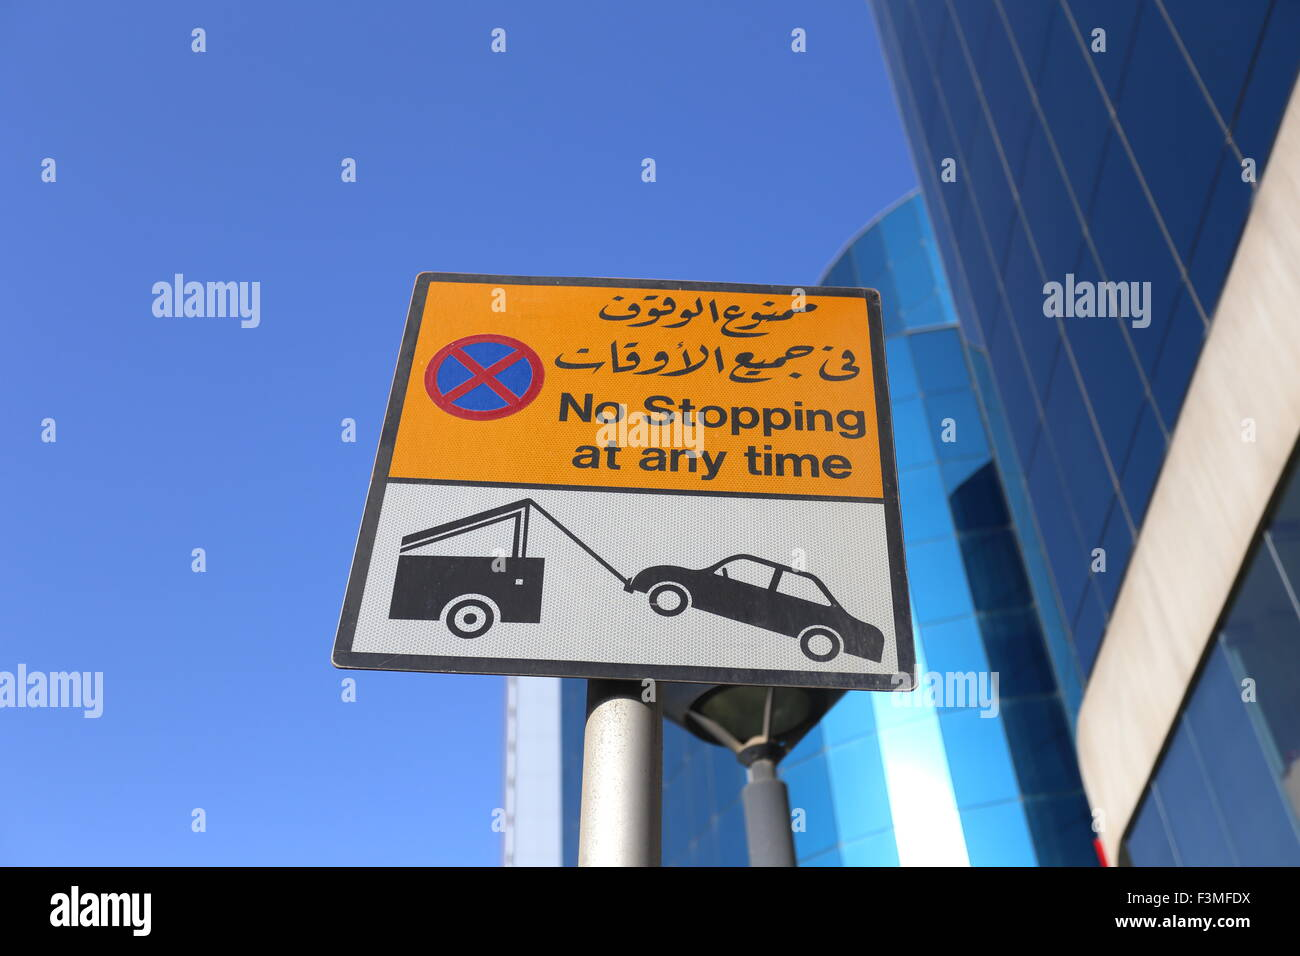 Sign in Arabic and English indicating No Stopping at Any Time, Manama, Kingdom of Bahrain - Stock Image